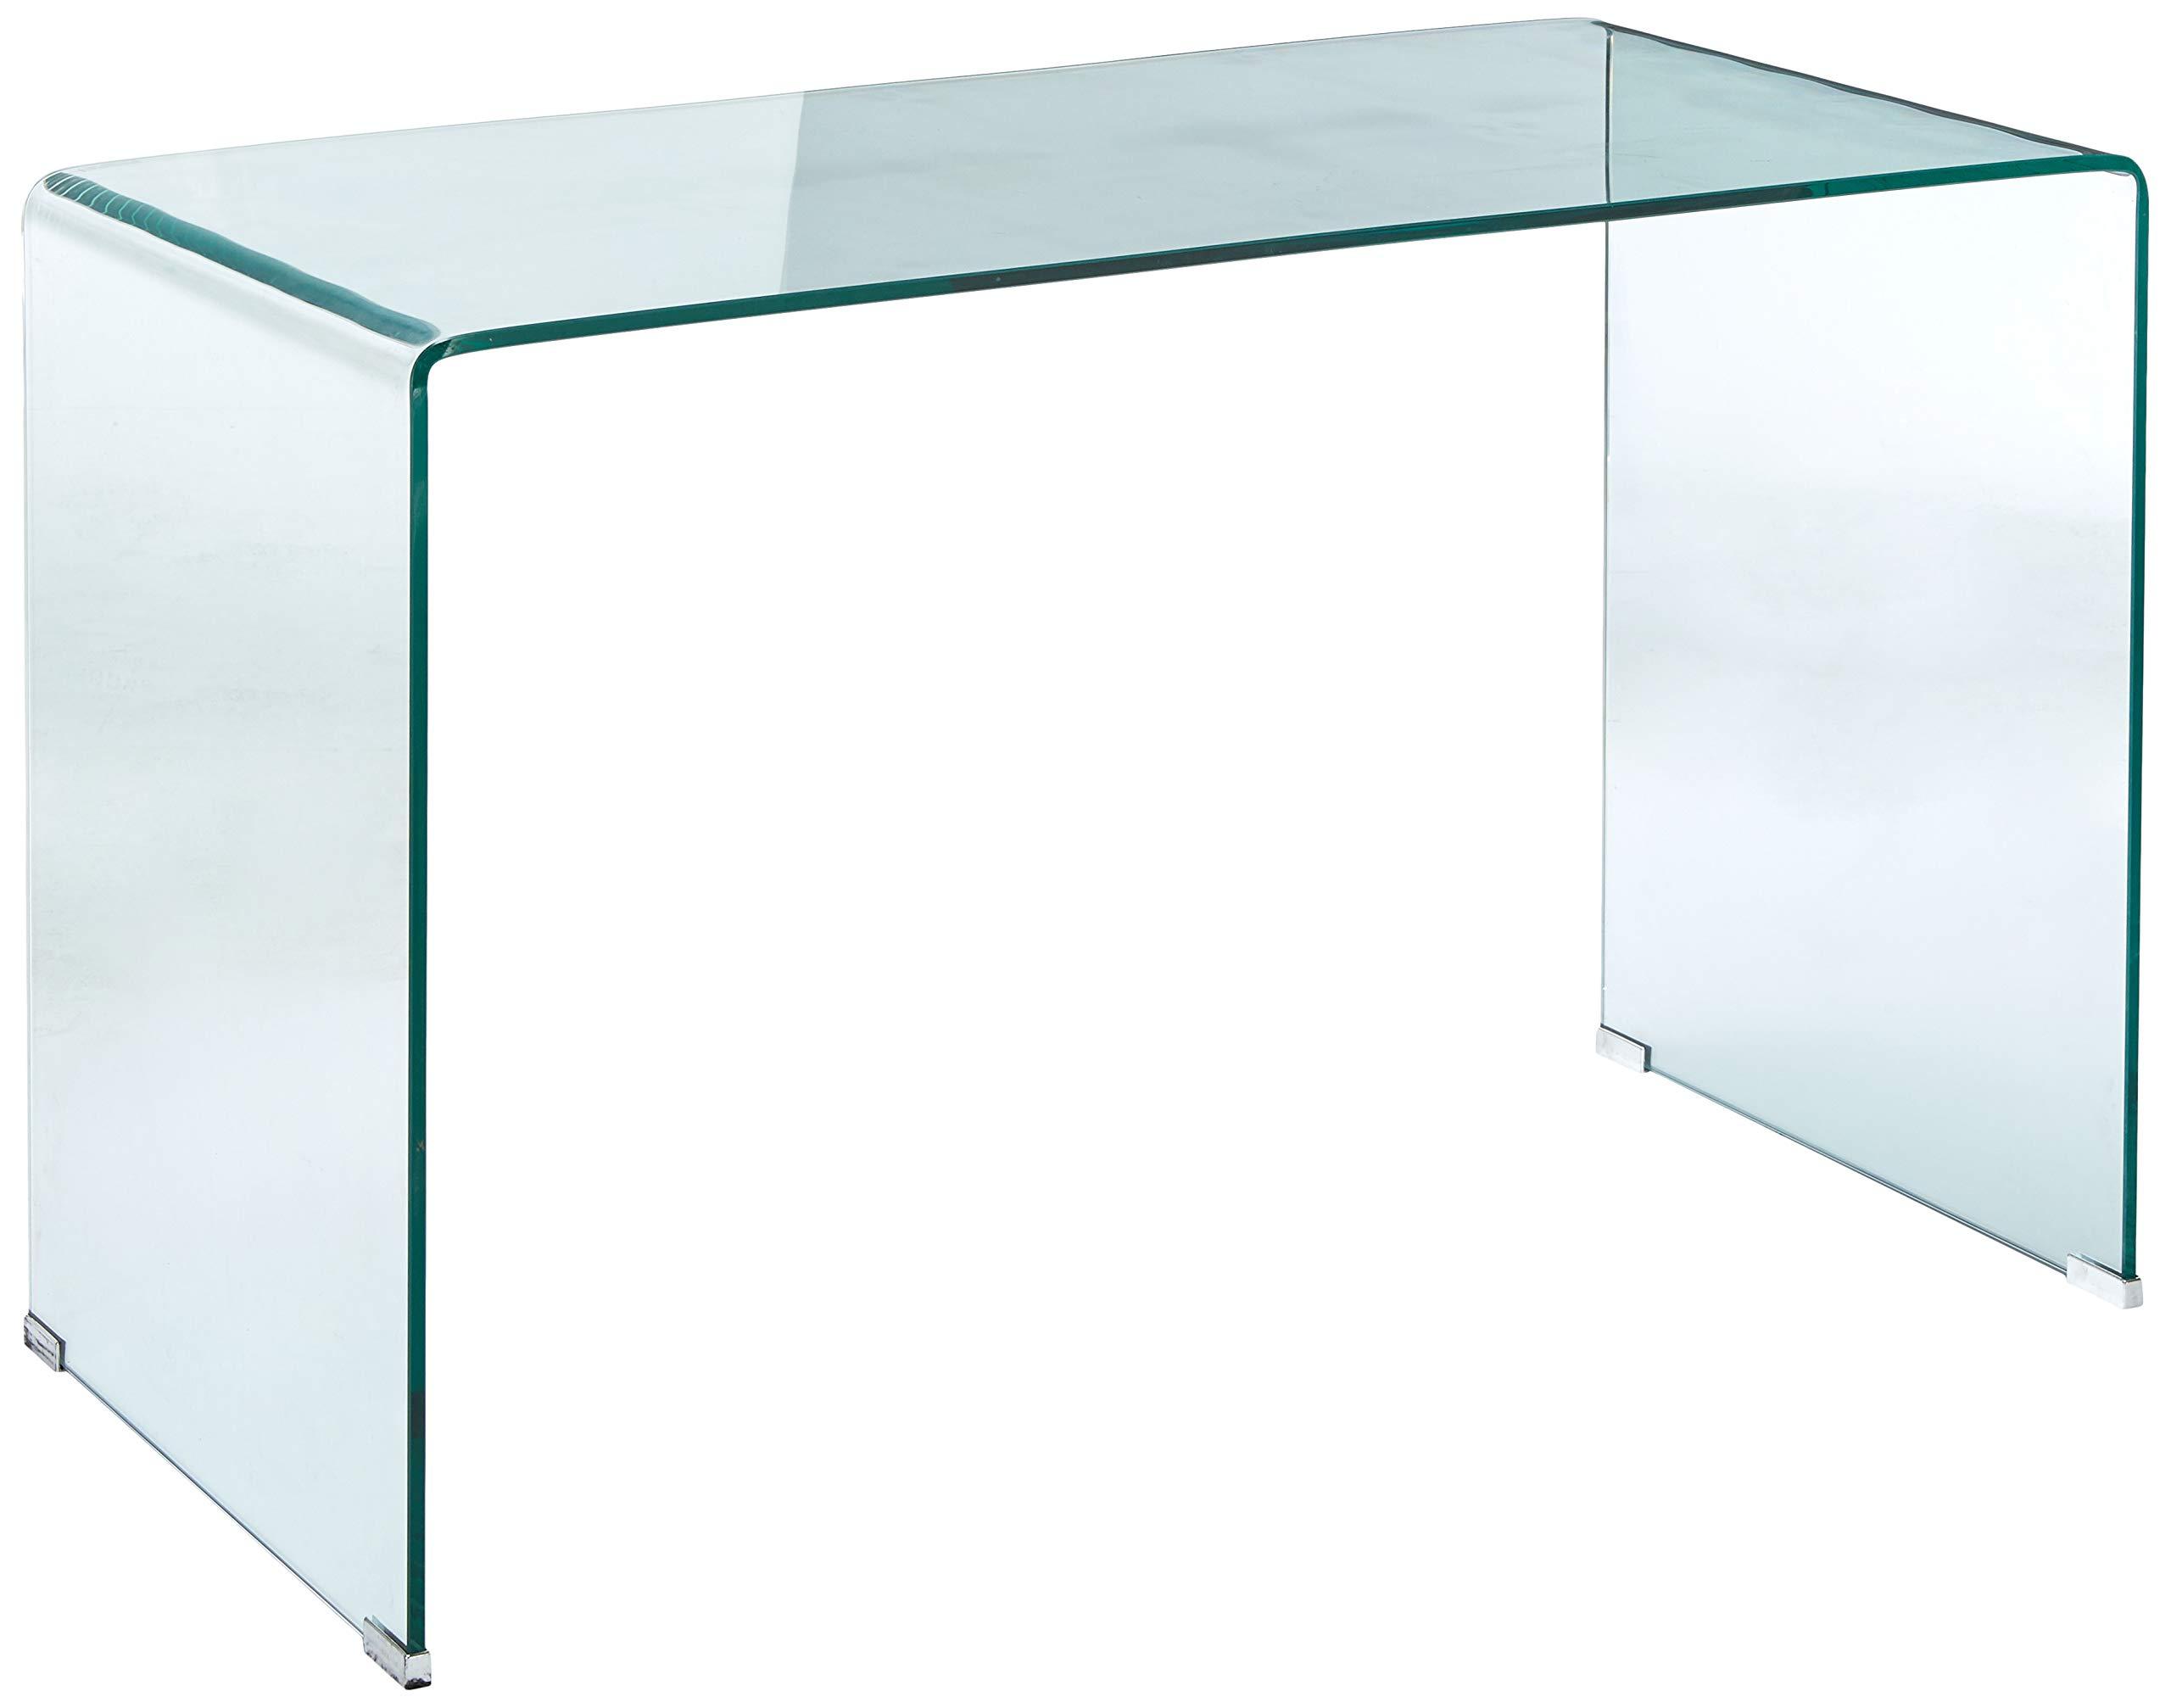 Coaster Home Furnishings 801581 Writing Desk, Clear and Chrome by Coaster Home Furnishings